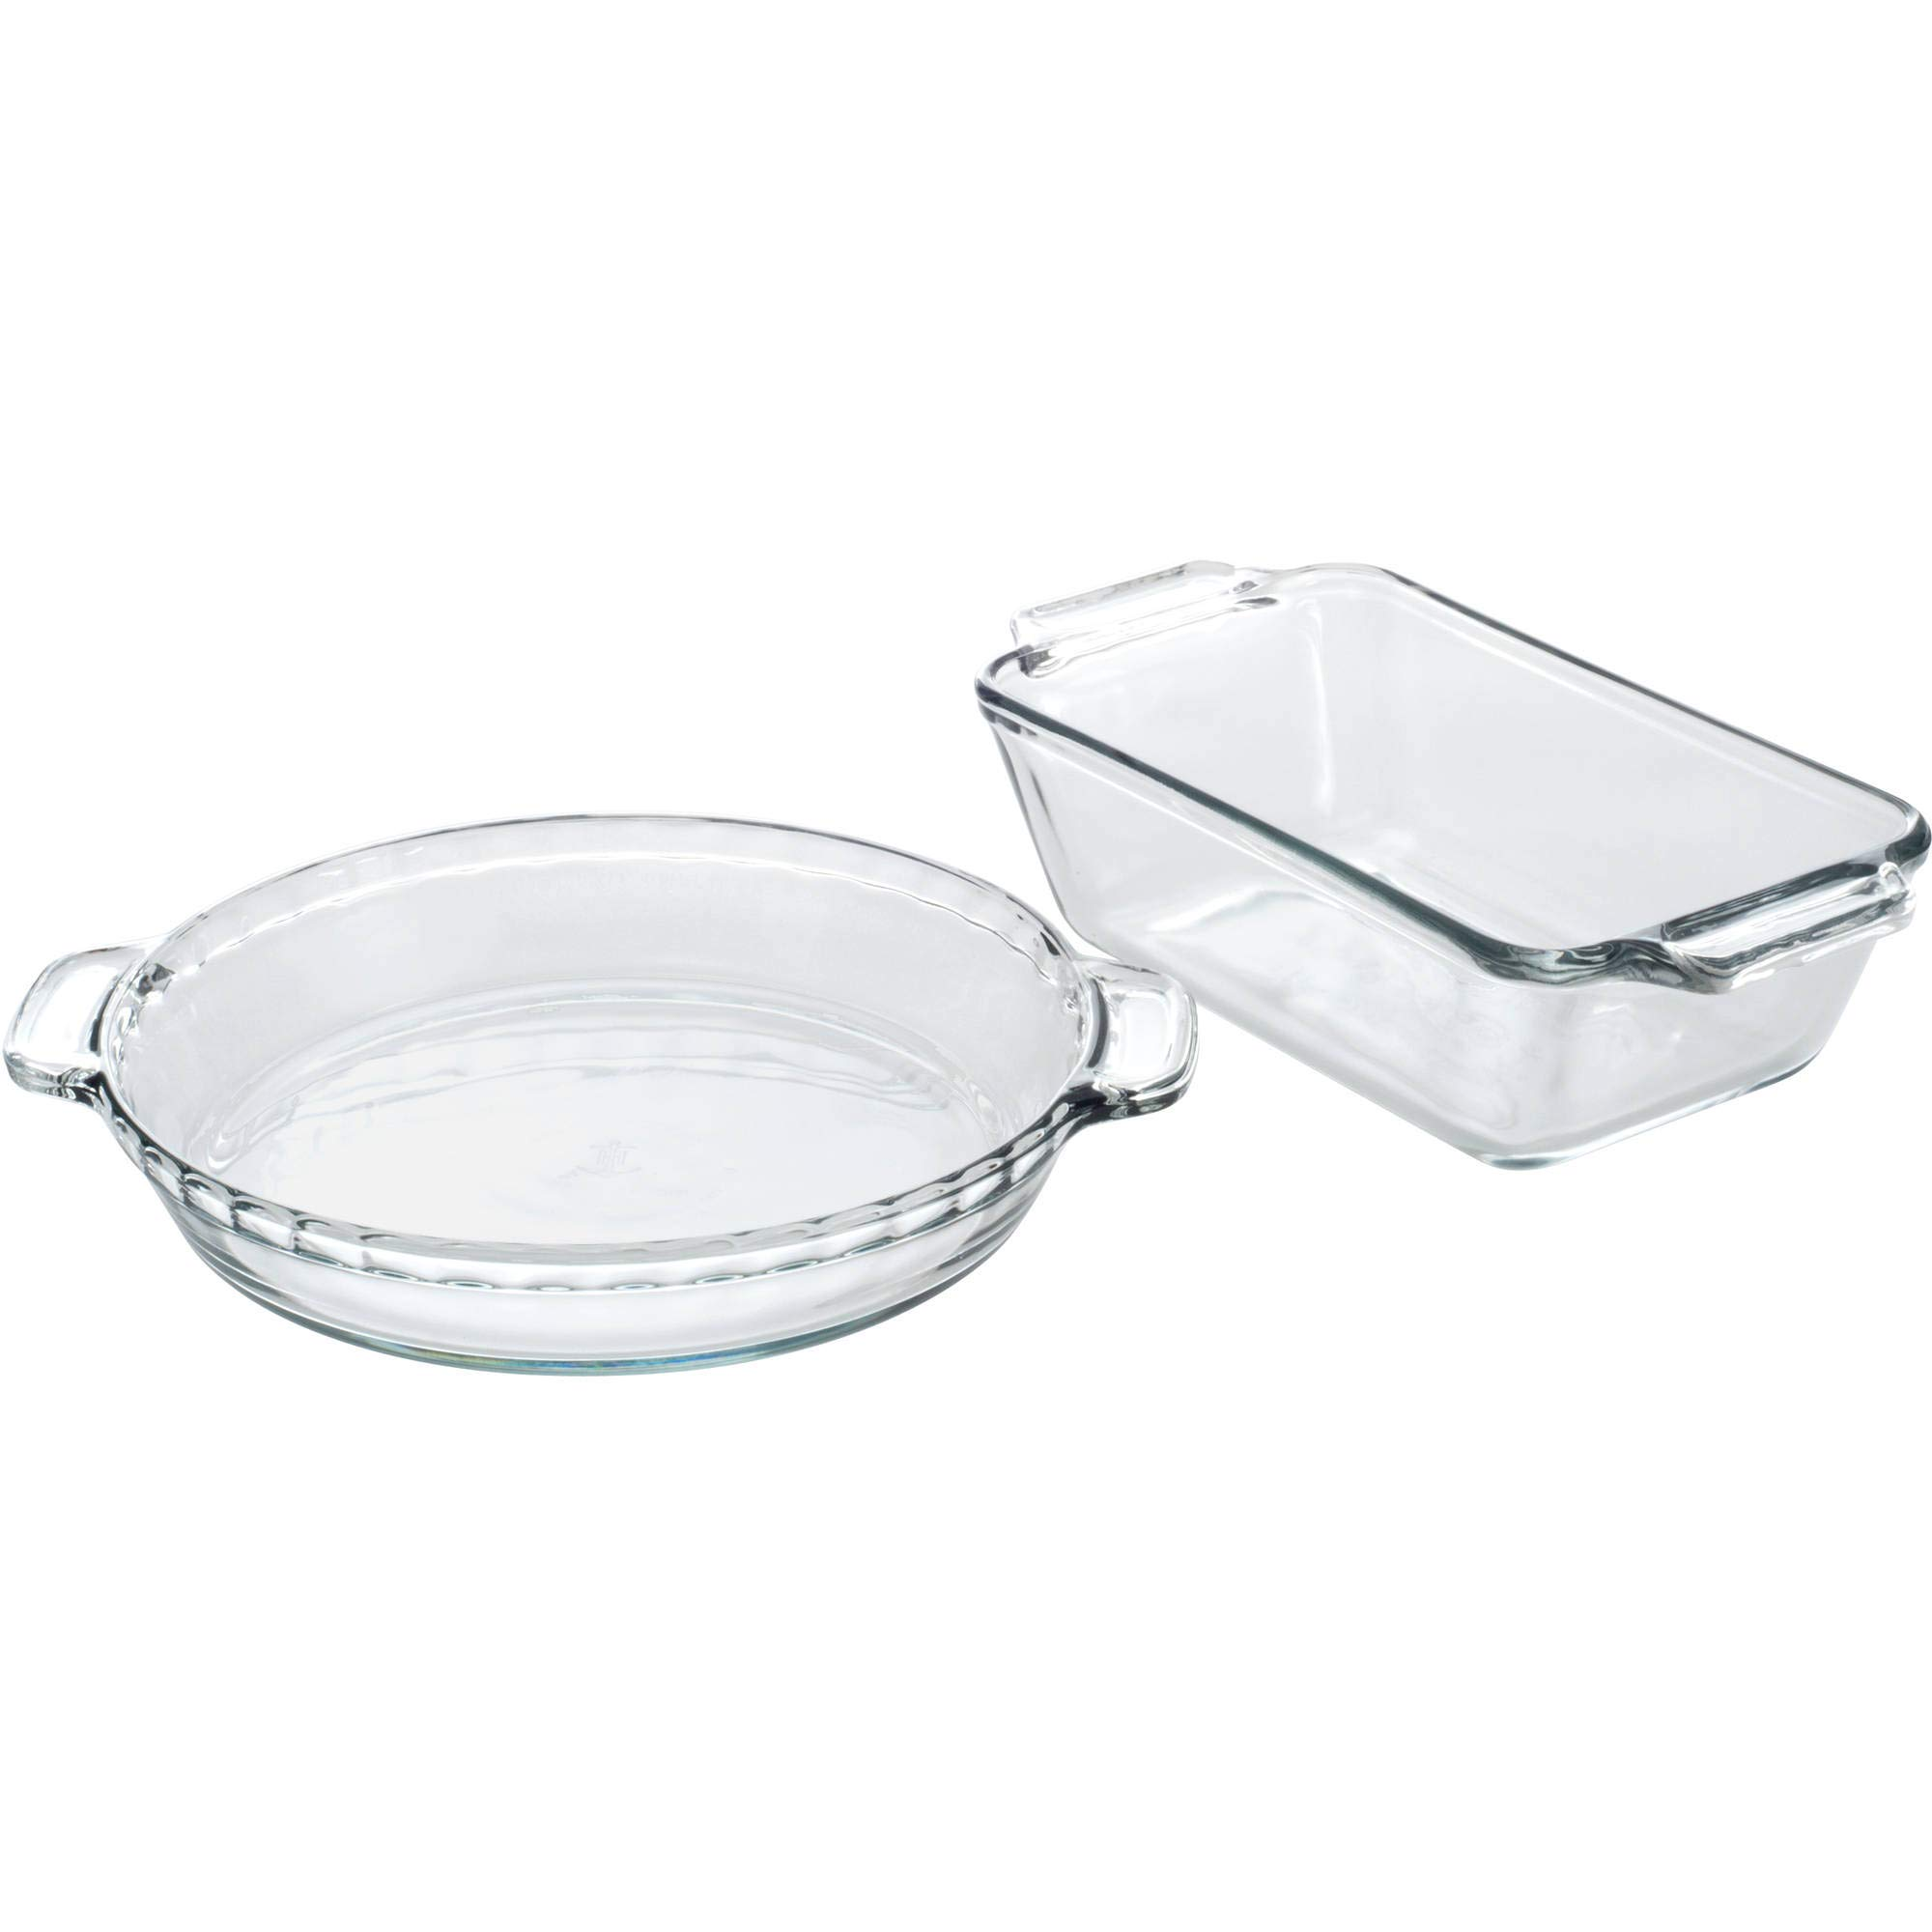 Anchor Hocking Glass Bakeware Set, Clear (11-Piece)